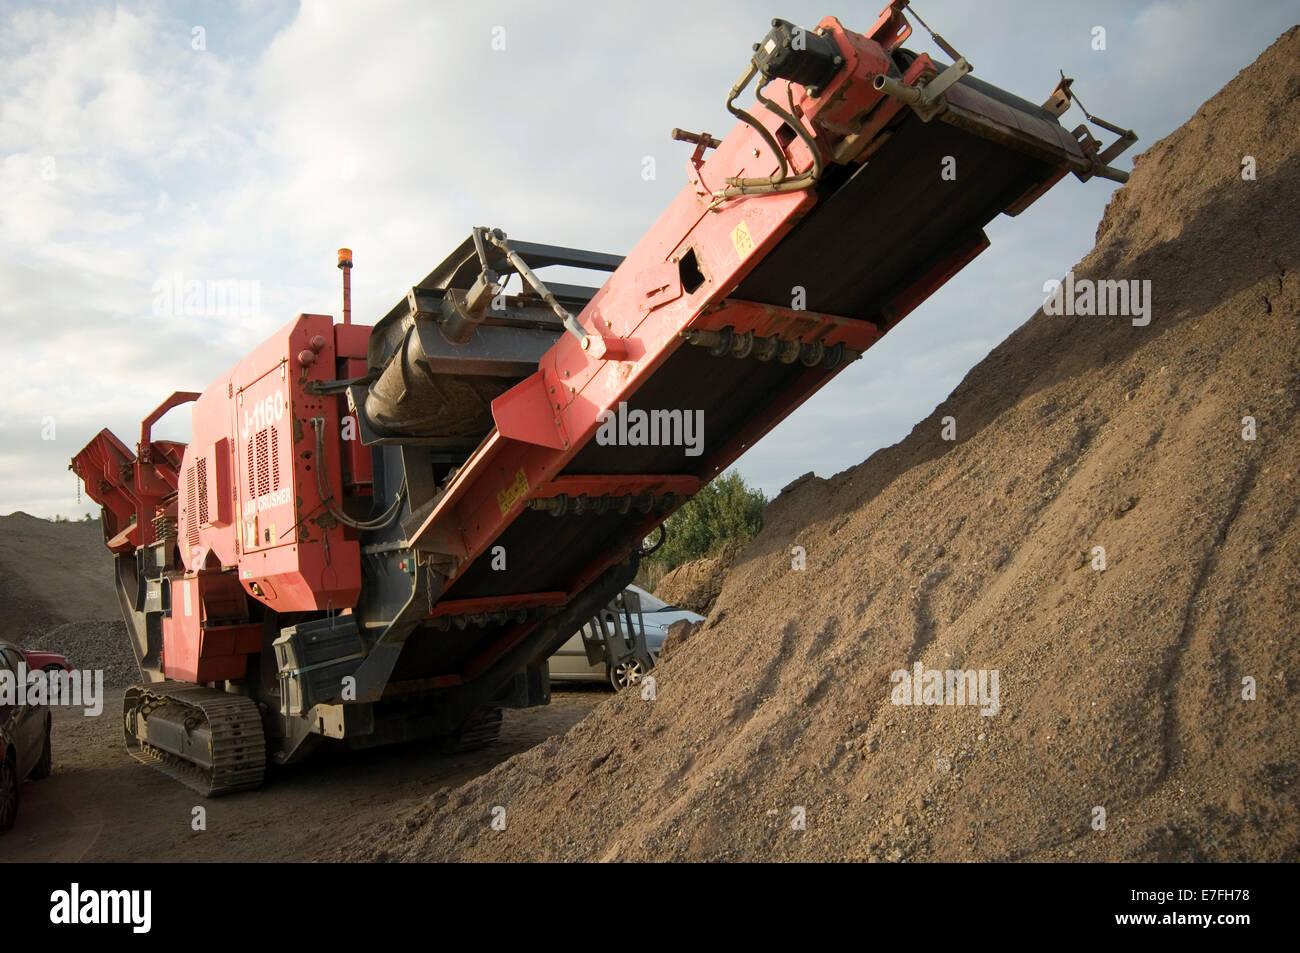 Agregado de trituración trituradoras móviles de producción minera Canteras demolición Construcción Imagen De Stock